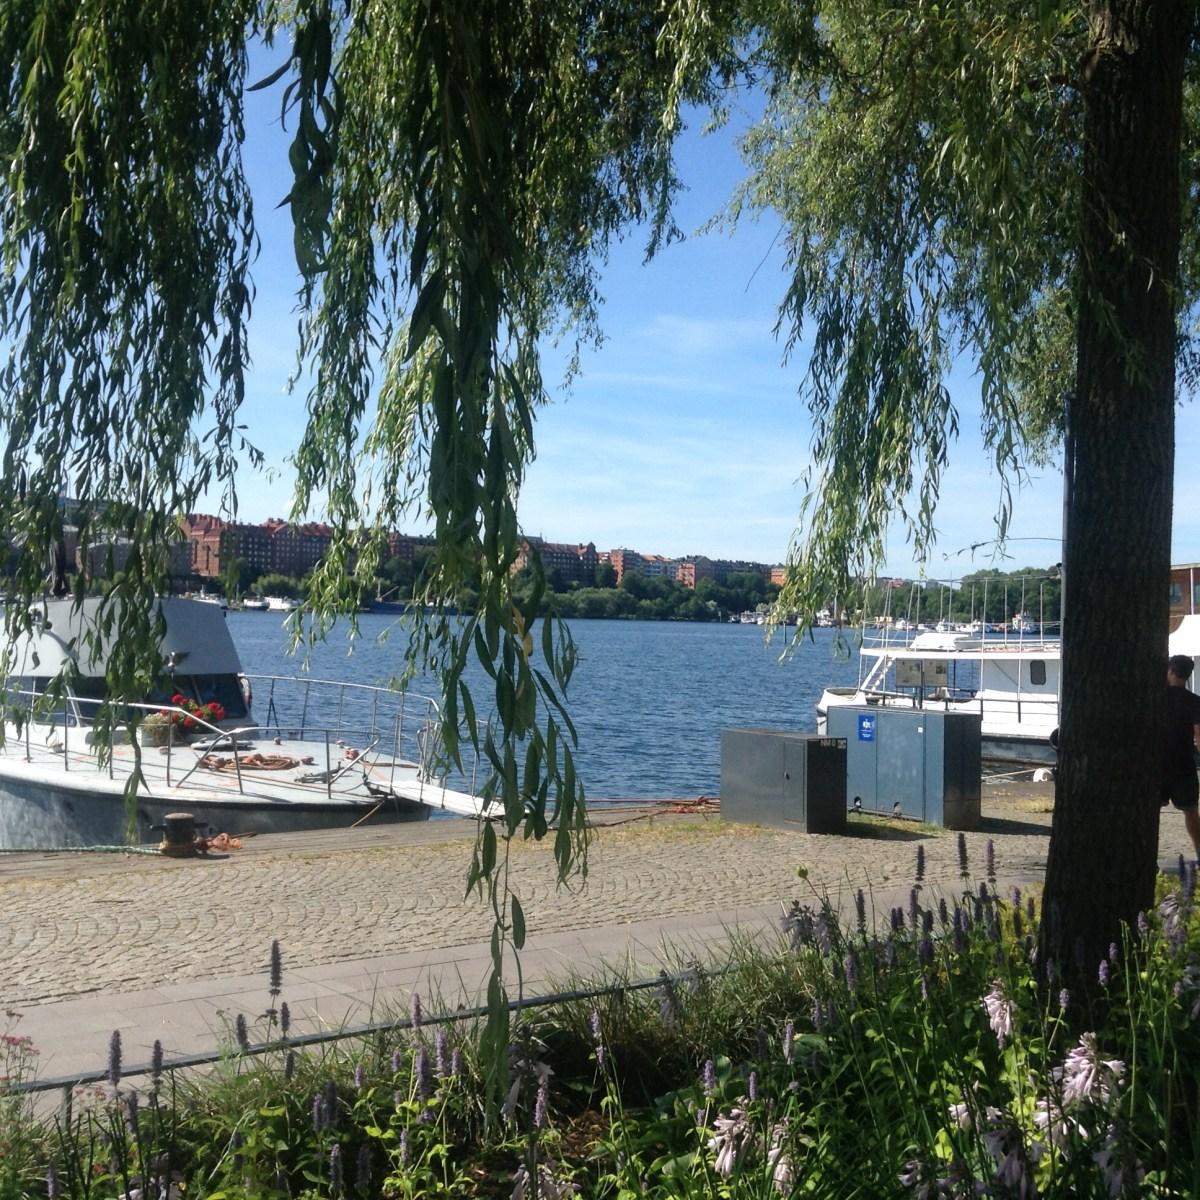 Stockholm Mälarenstrand